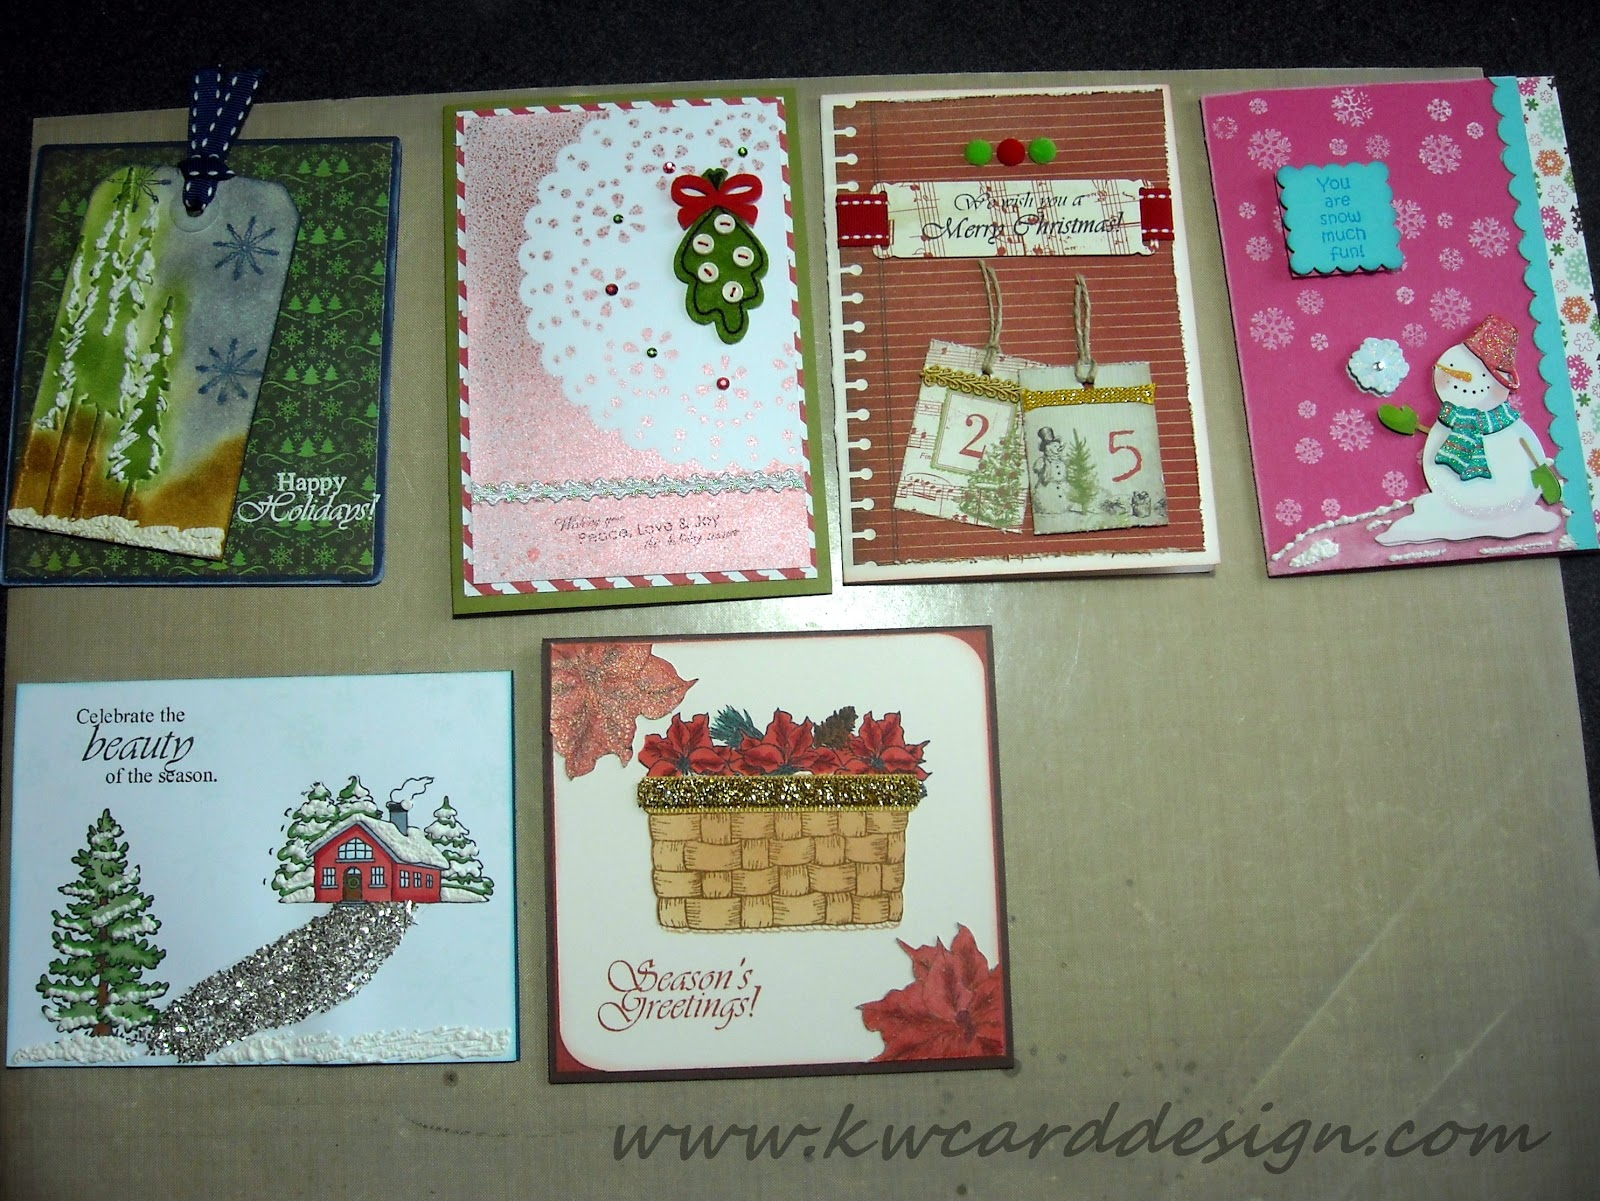 Kwcarddesign Christmas Card Swap 18 Cards I Made